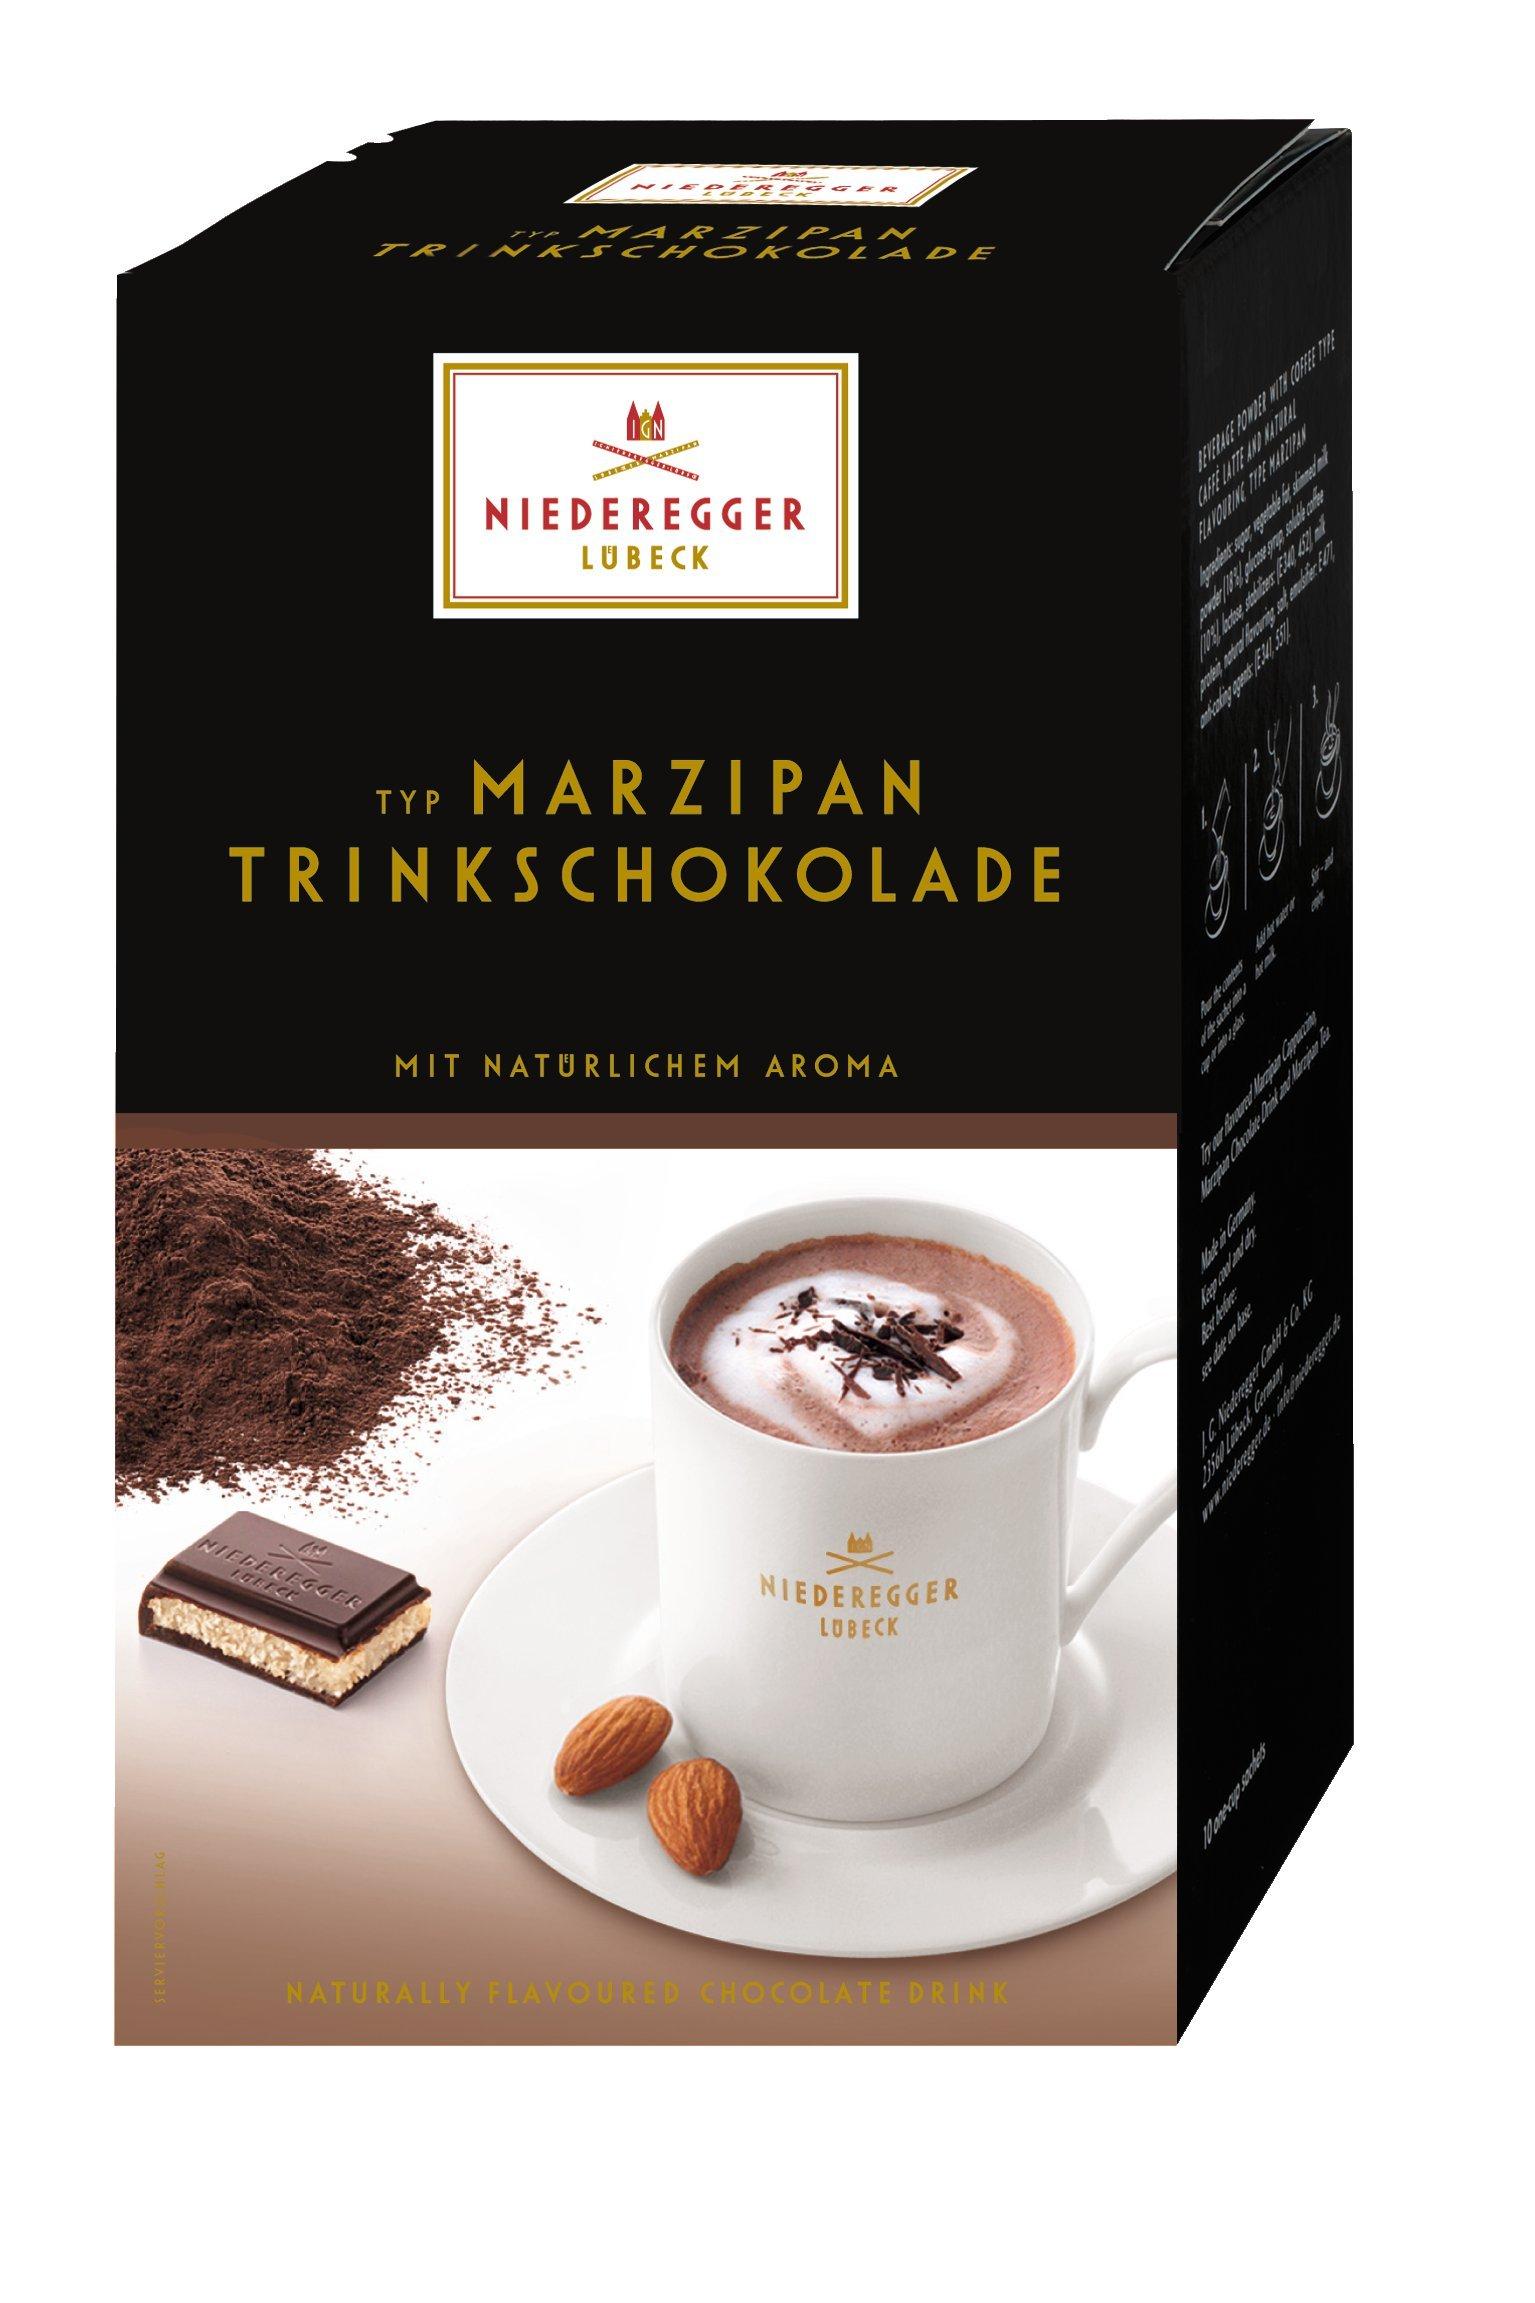 Niederegger Marzipan Drink Chocolate (Trinkschokolade) 250g